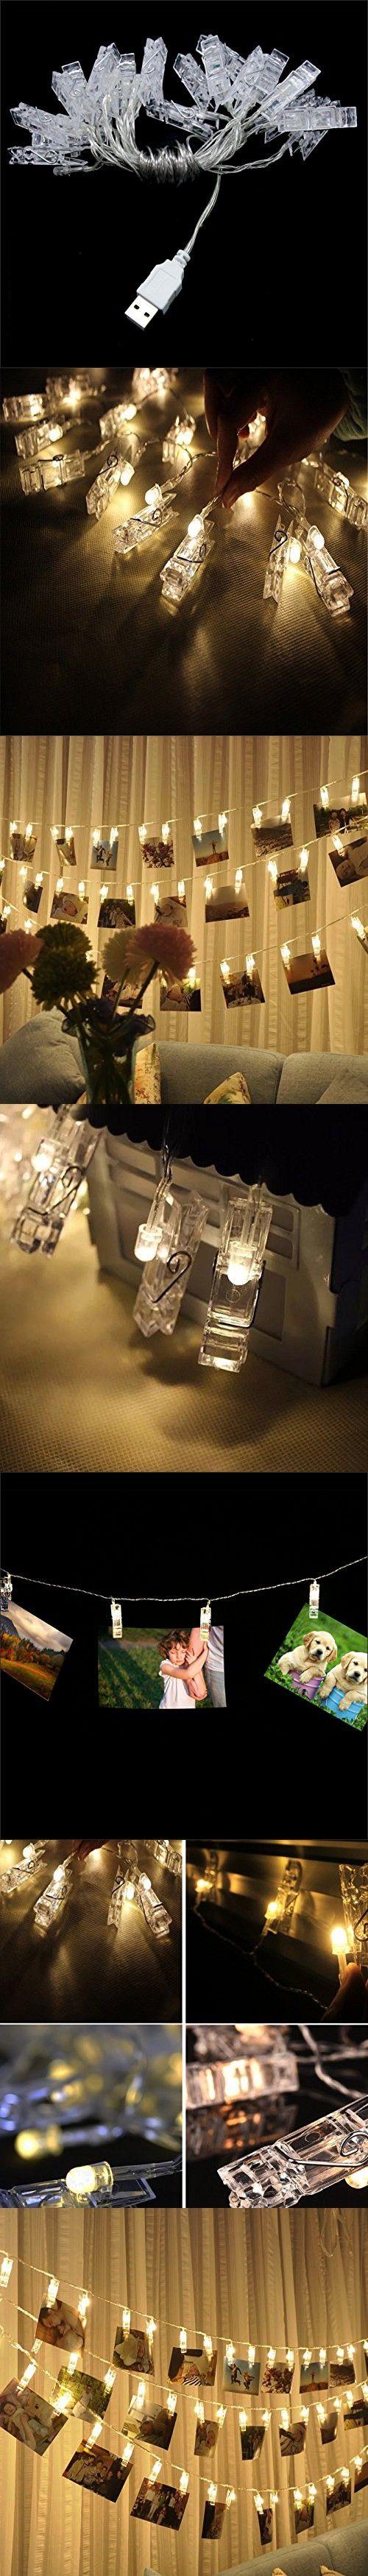 warmoor 20 photo clips string lights christmas lights 164 feet indooroutdoor usb - Usb Powered Christmas Lights